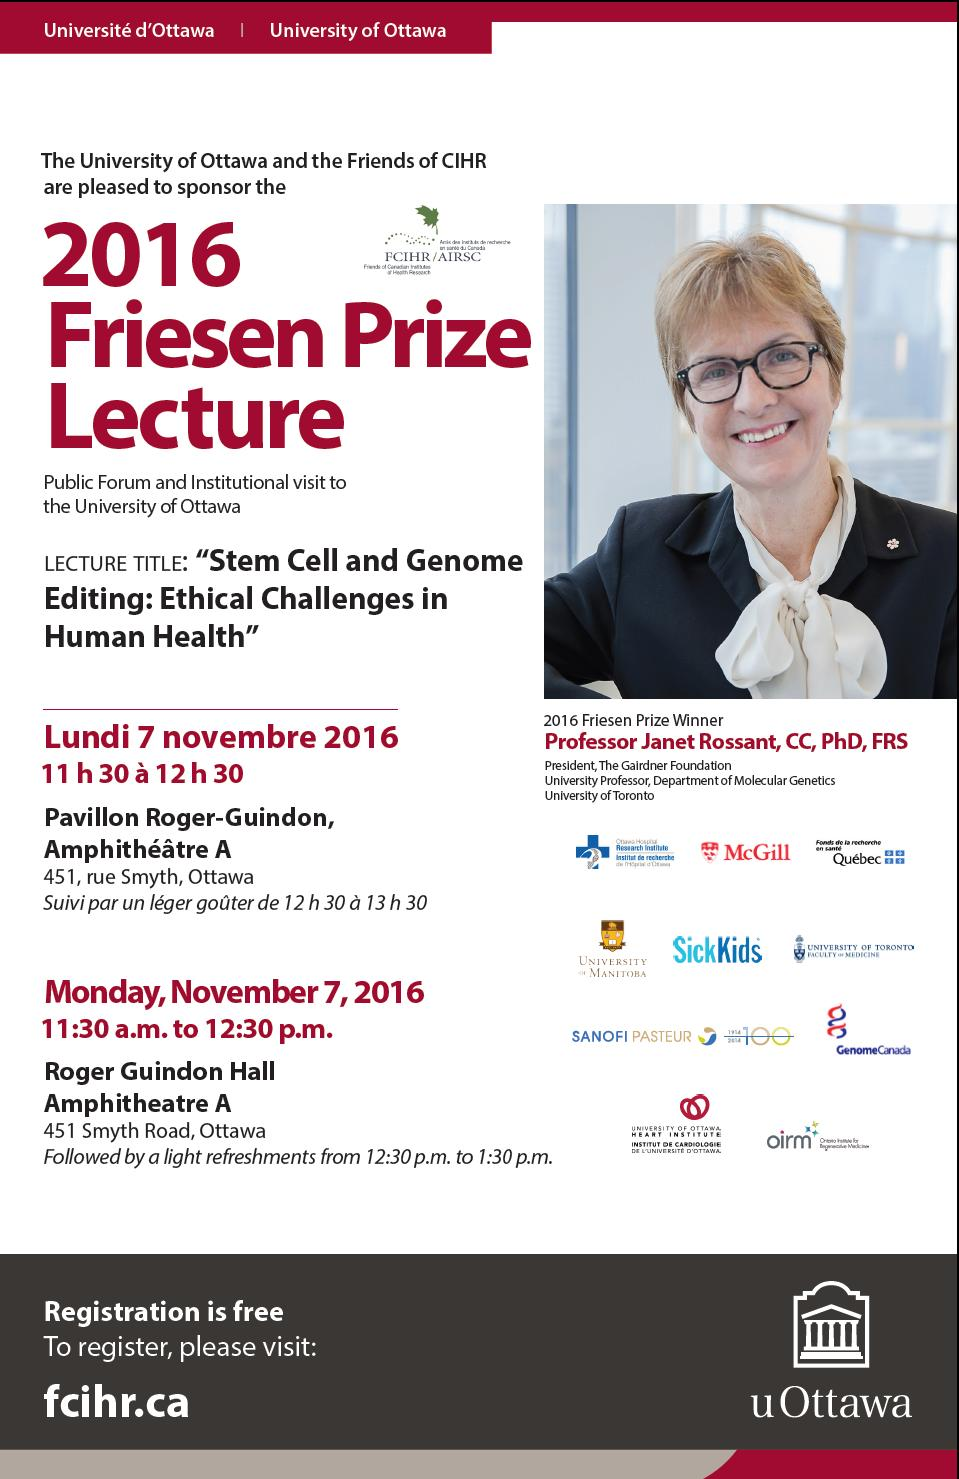 2016 U Ottawa Poster - Dr. Janet Rossant - 2016 Friesen Prizewinner